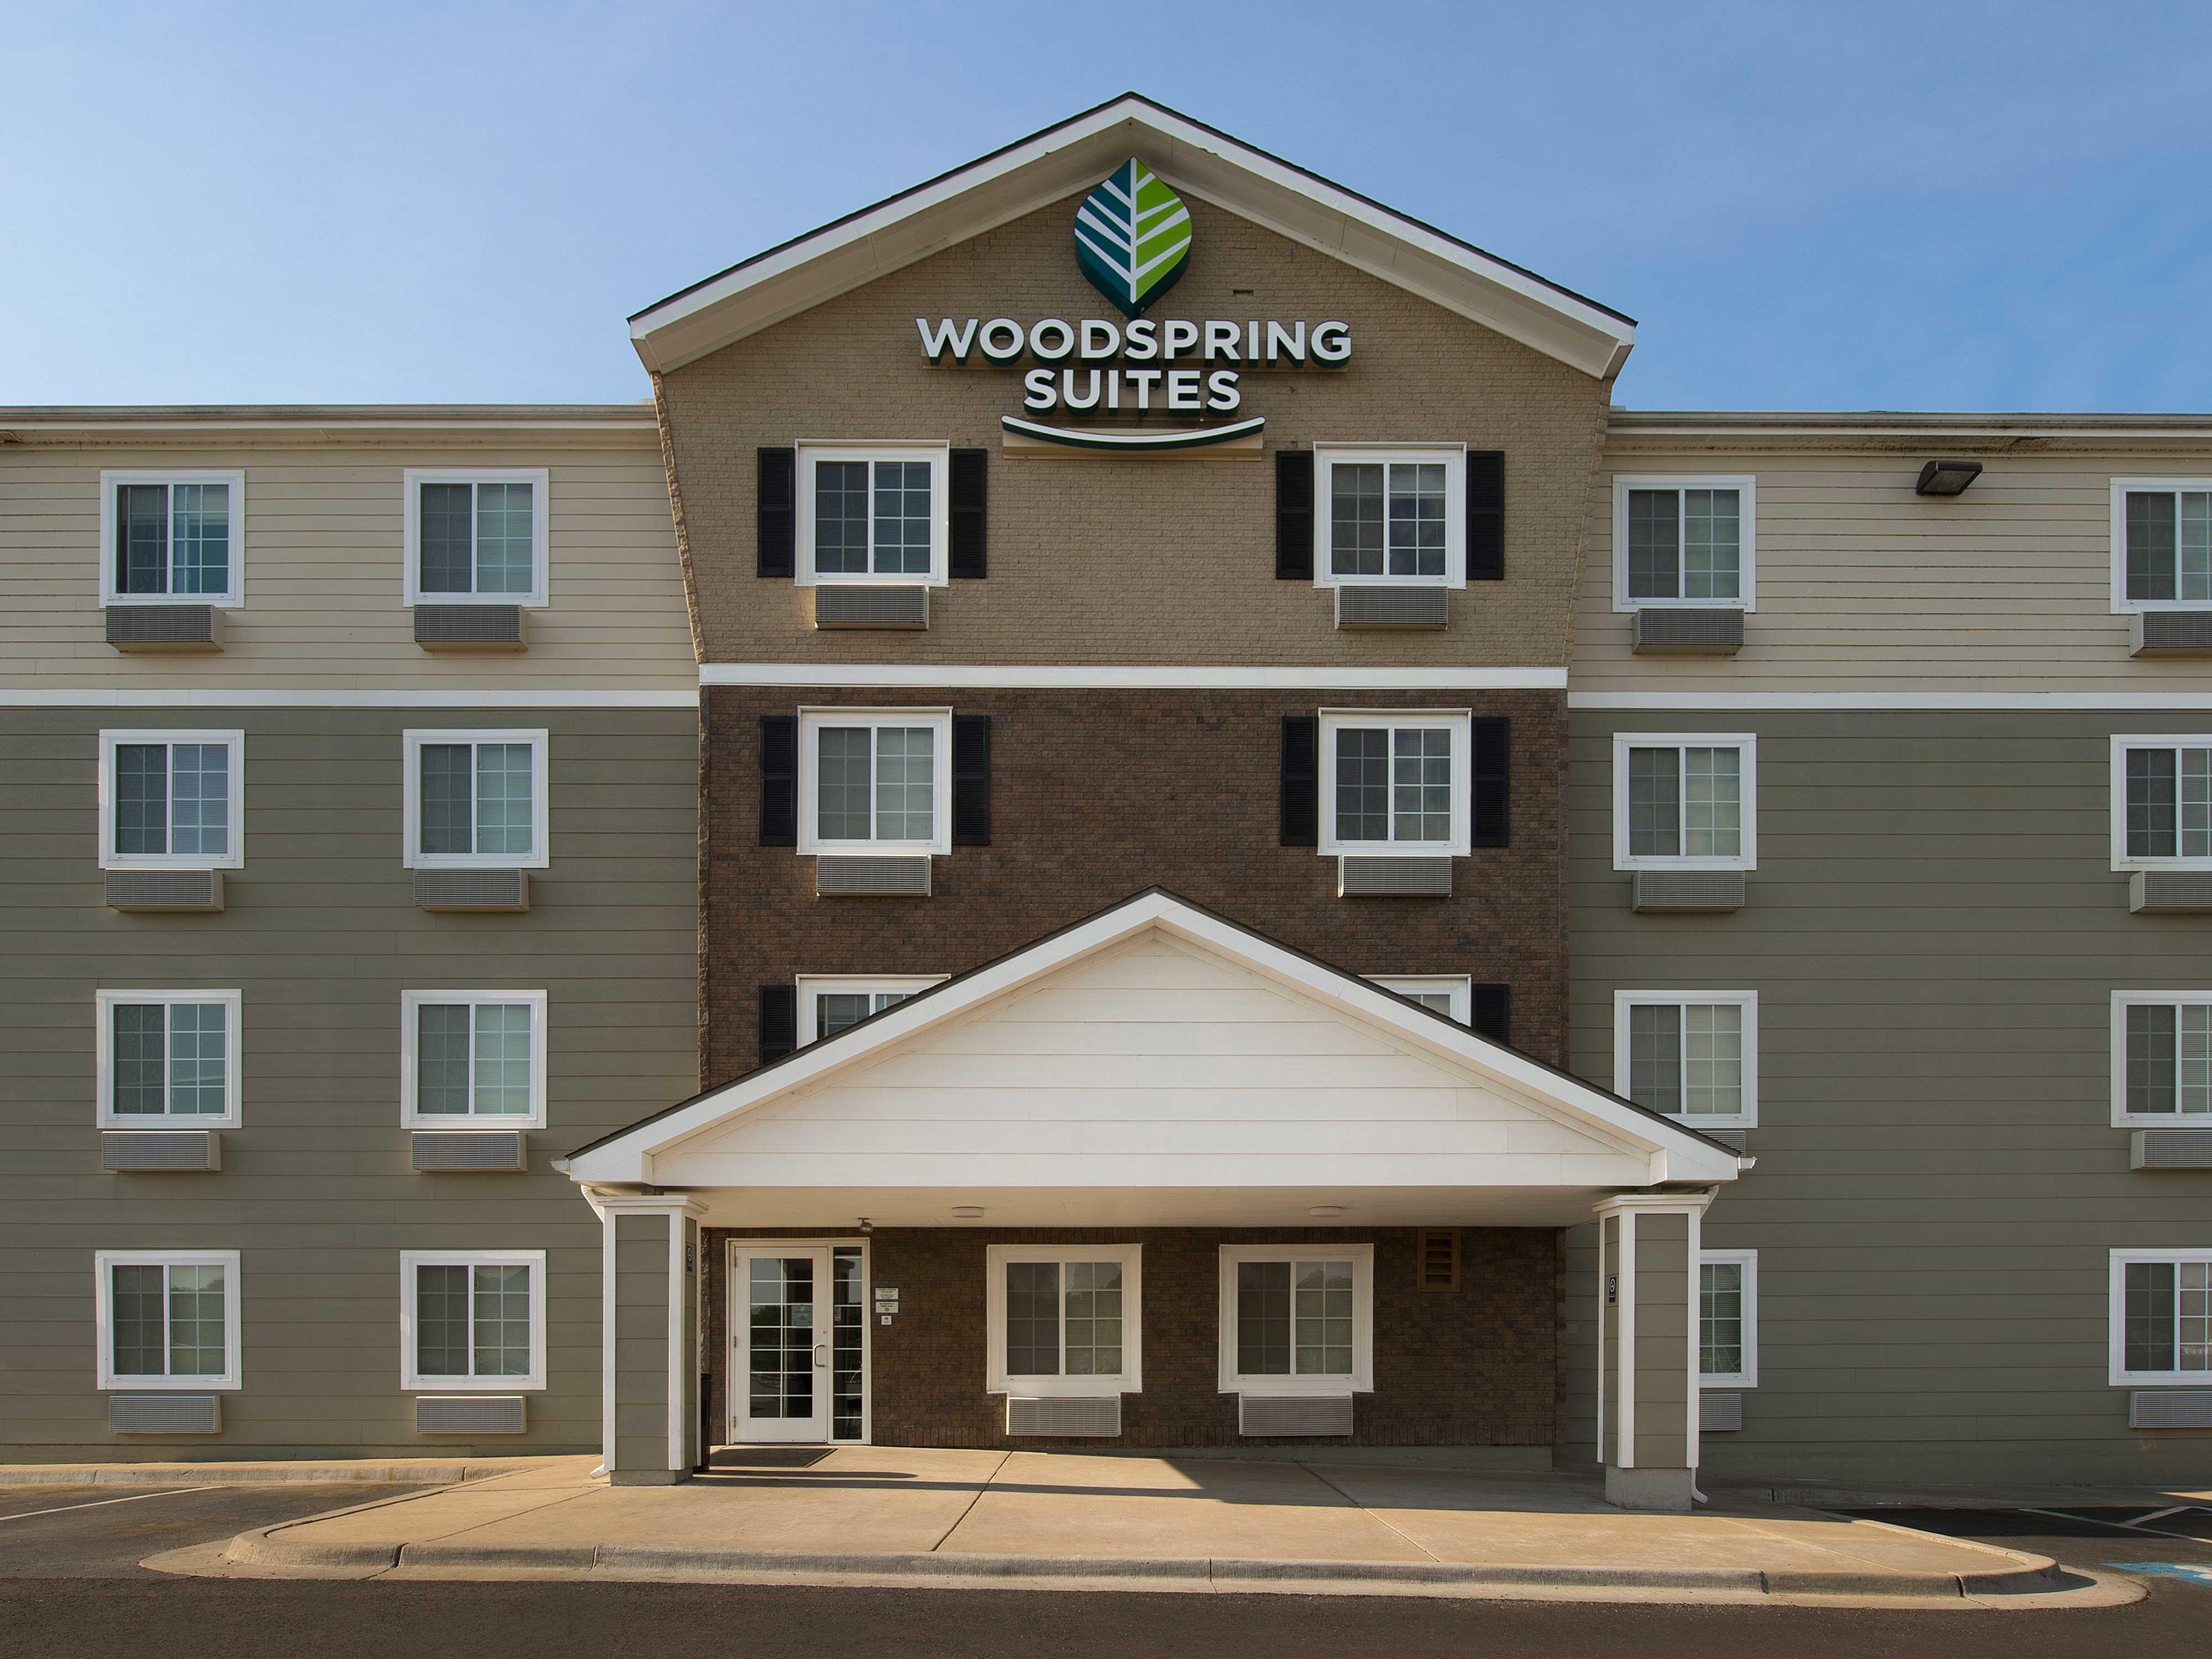 WoodSpring Suites Kansas City Mission image 2